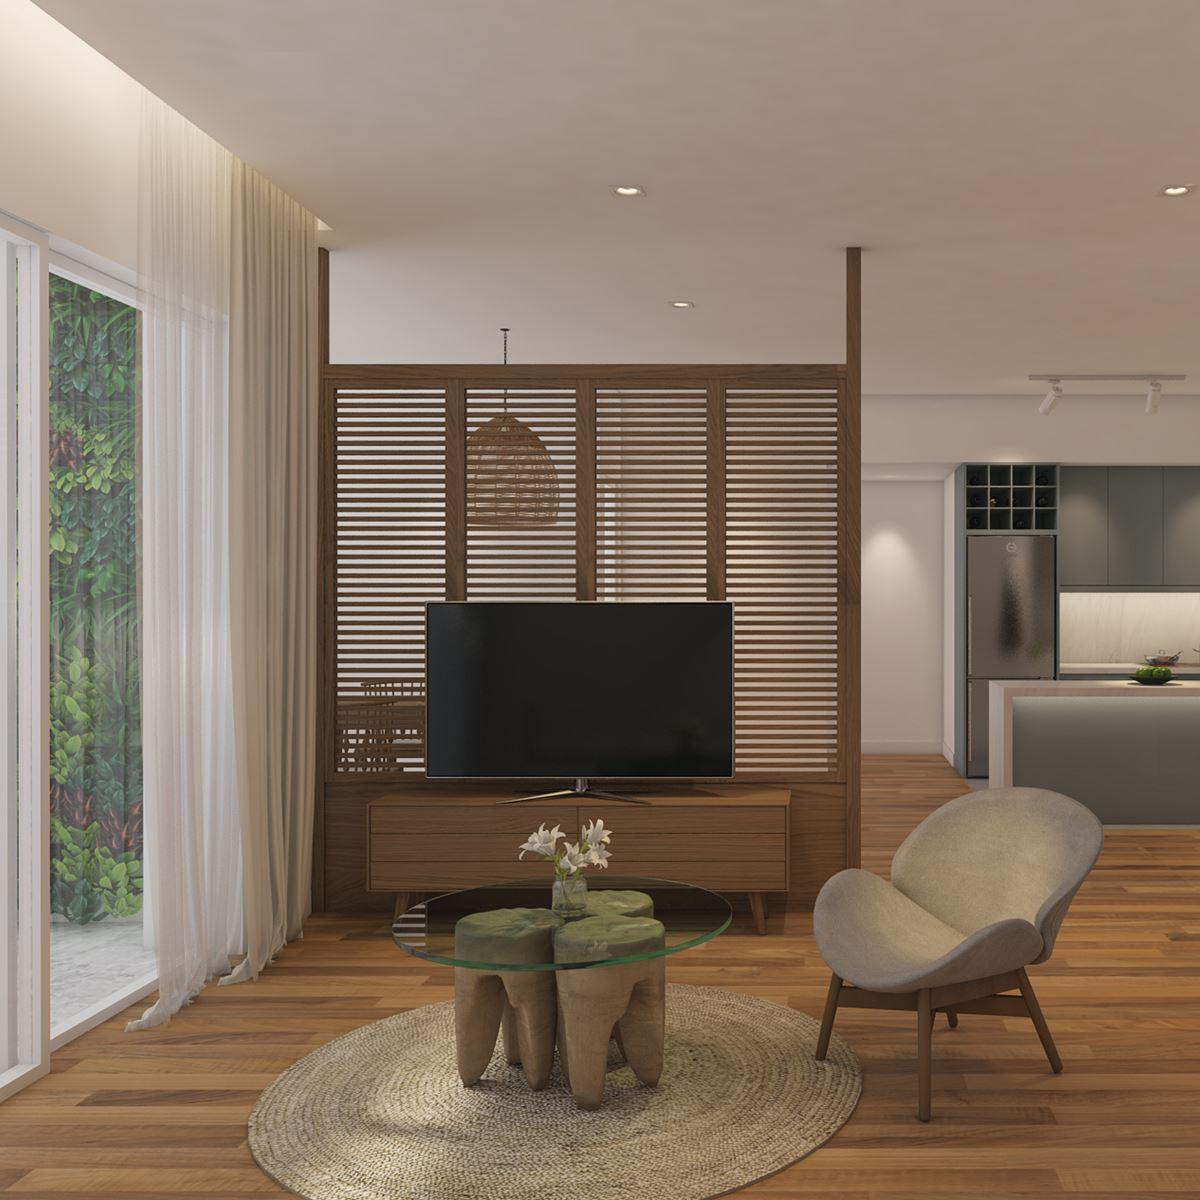 Mỹ Phú Apartment